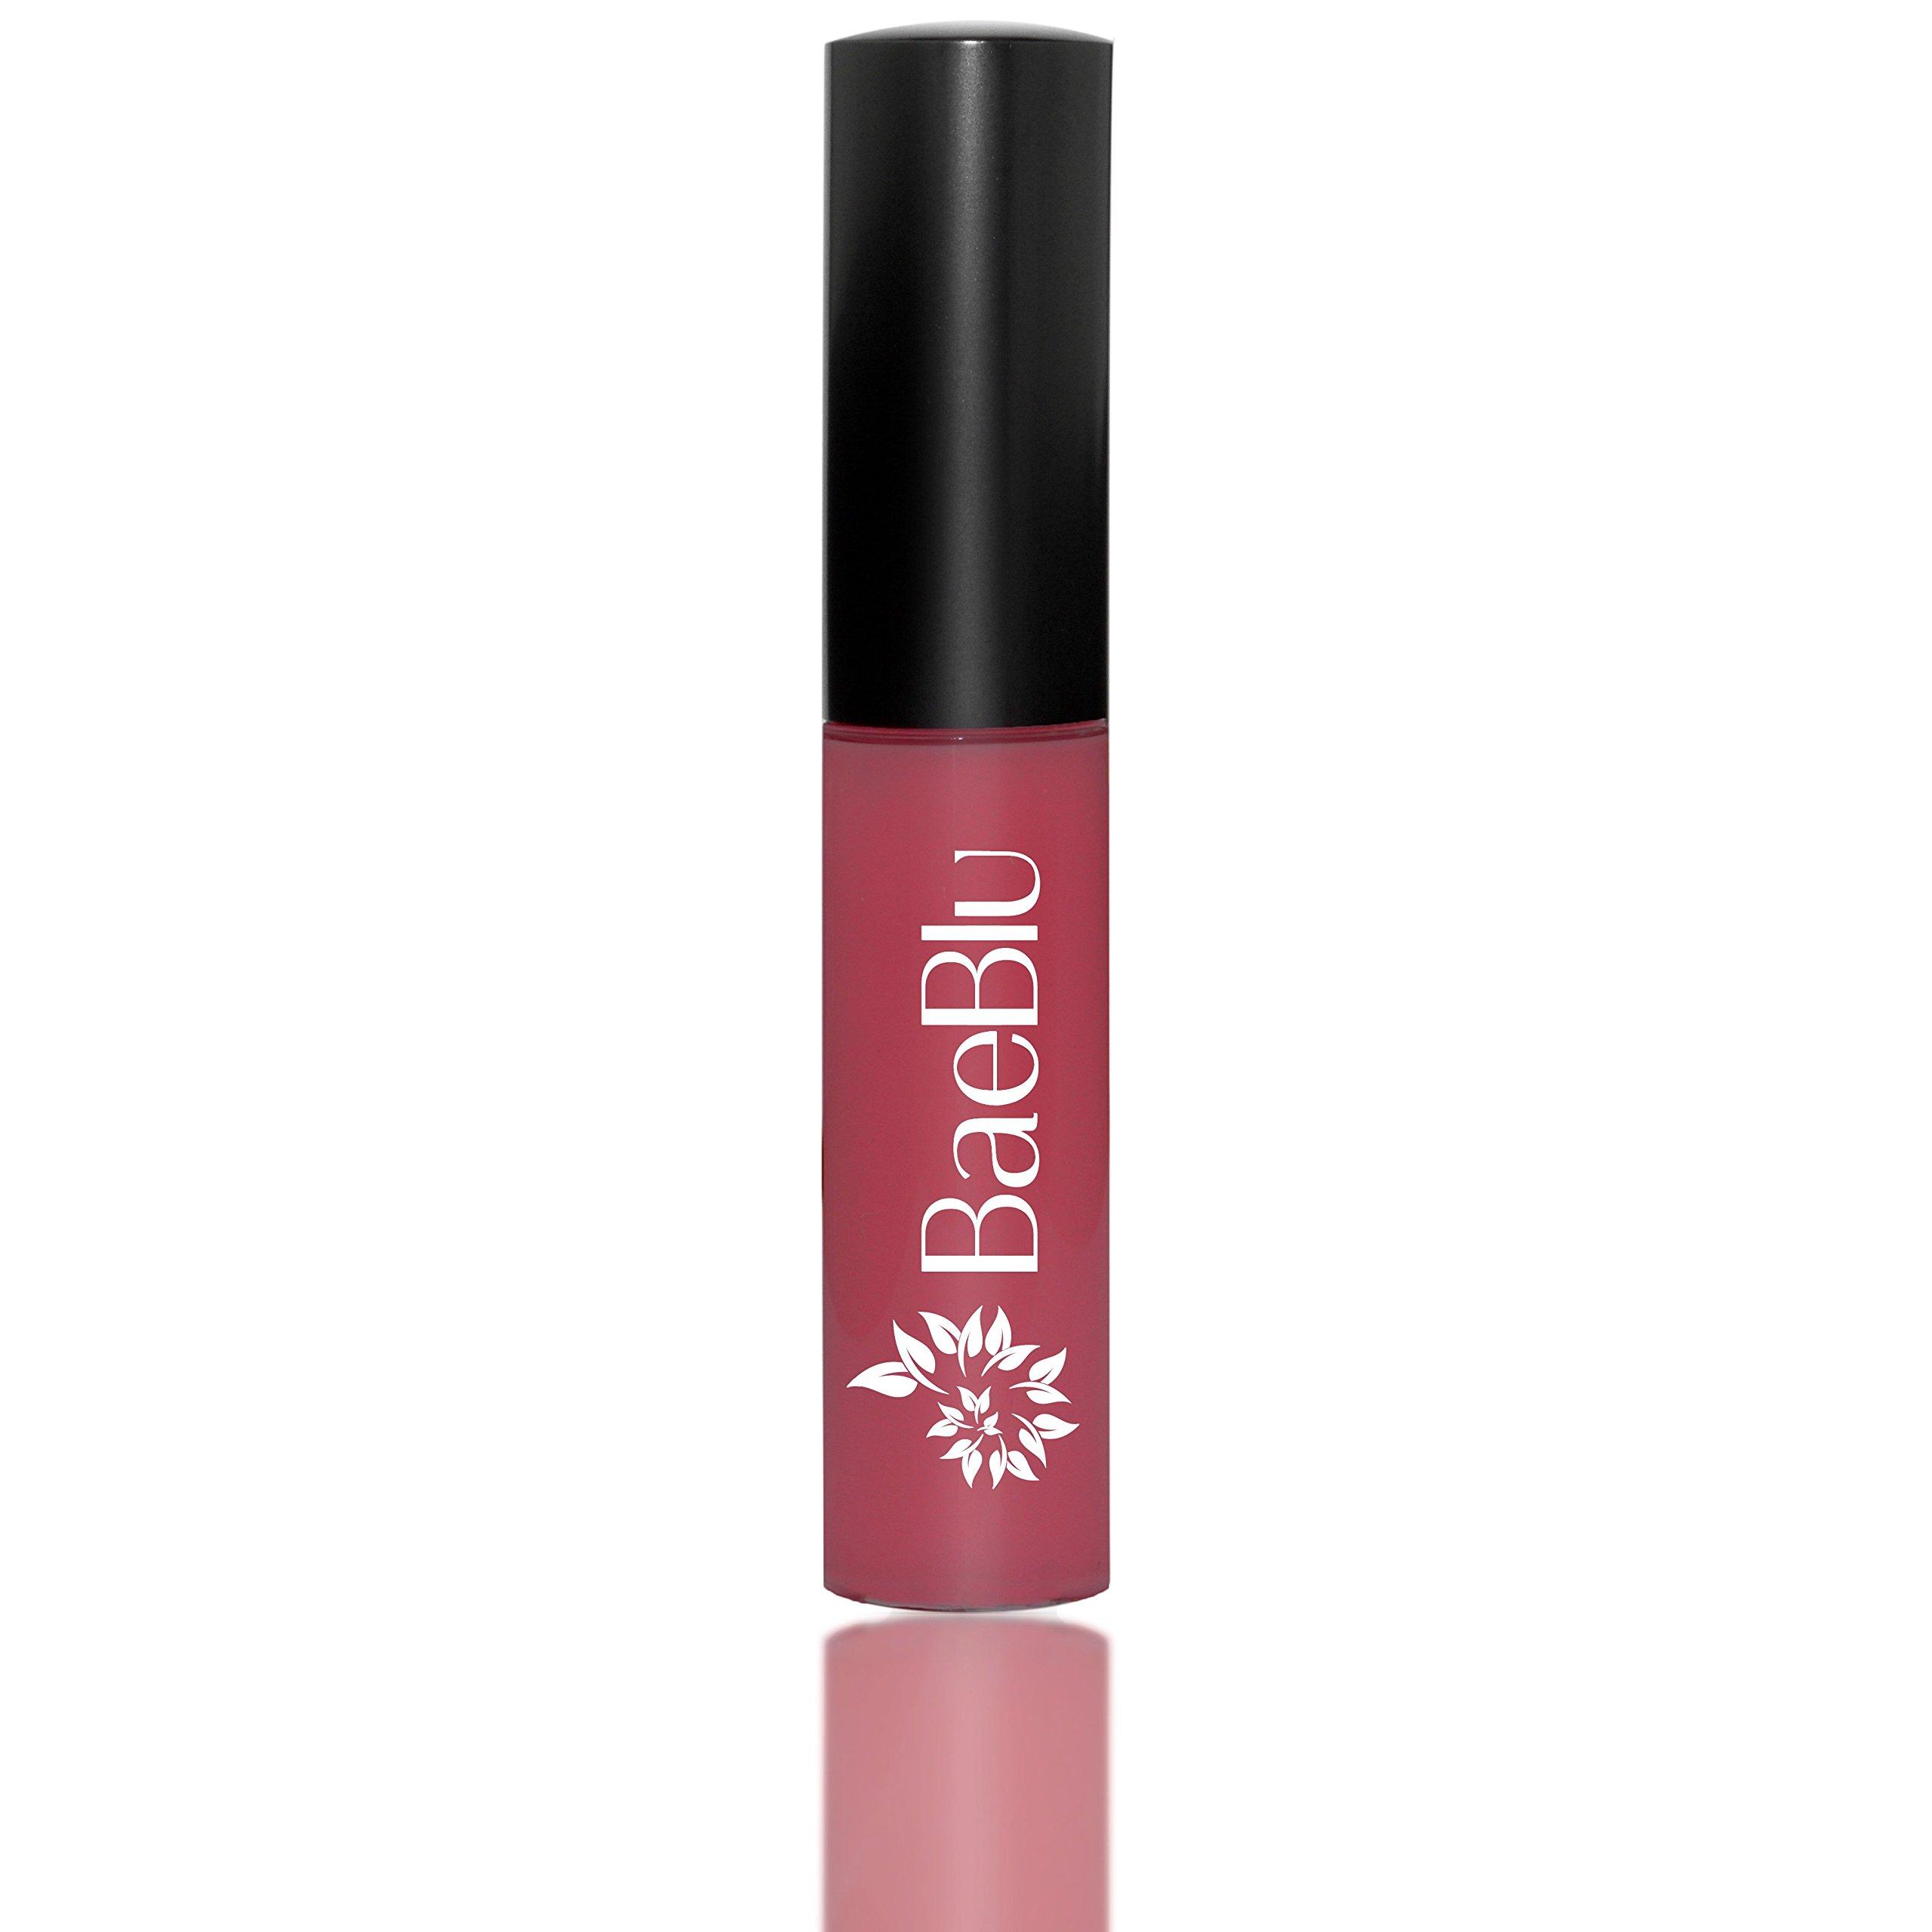 BaeBlu Organic Vegan Lip Gloss, 100% Natural Non-Toxic Moisturizing Ingredients, Berry Boop